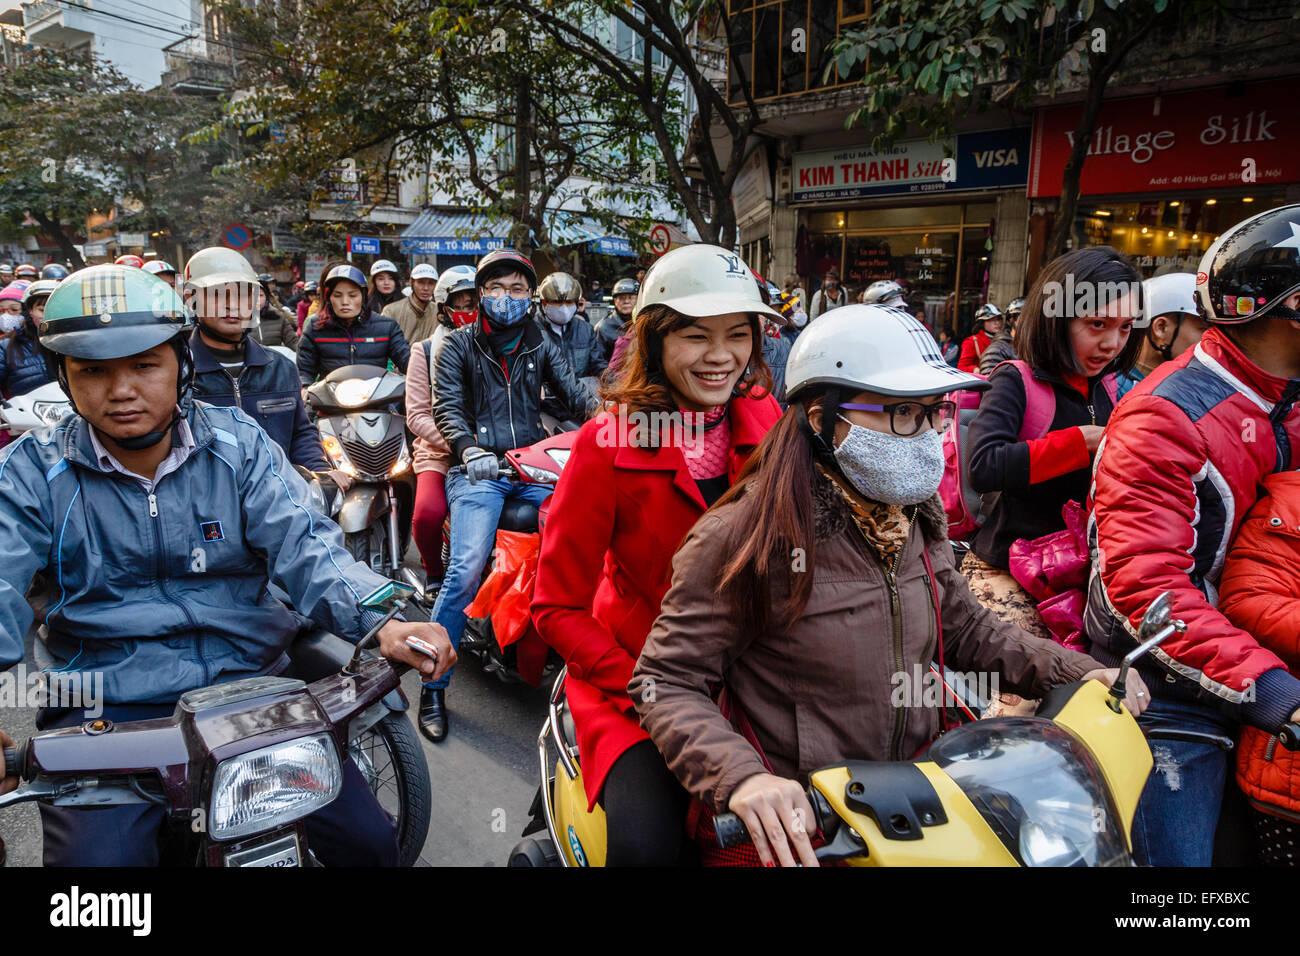 Busy traffic in the old quarter, Hanoi, Vietnam. - Stock Image